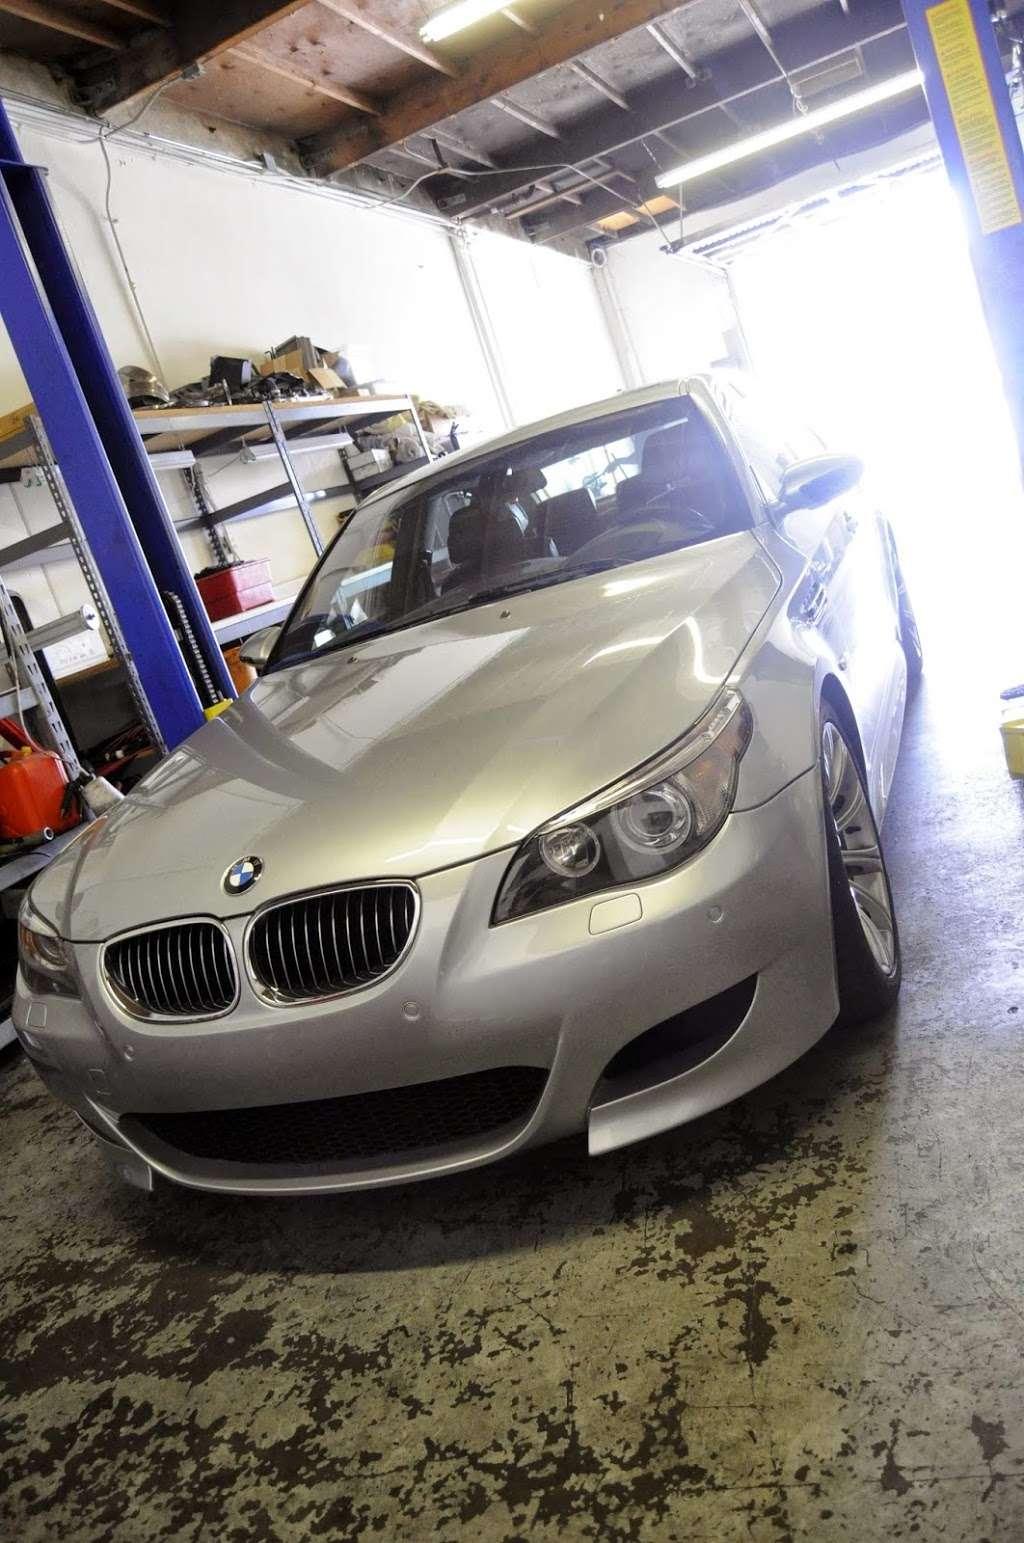 SMS European - car repair  | Photo 9 of 10 | Address: 5842 McFadden Ave, Suite A, Huntington Beach, CA 92649, USA | Phone: (714) 889-6553